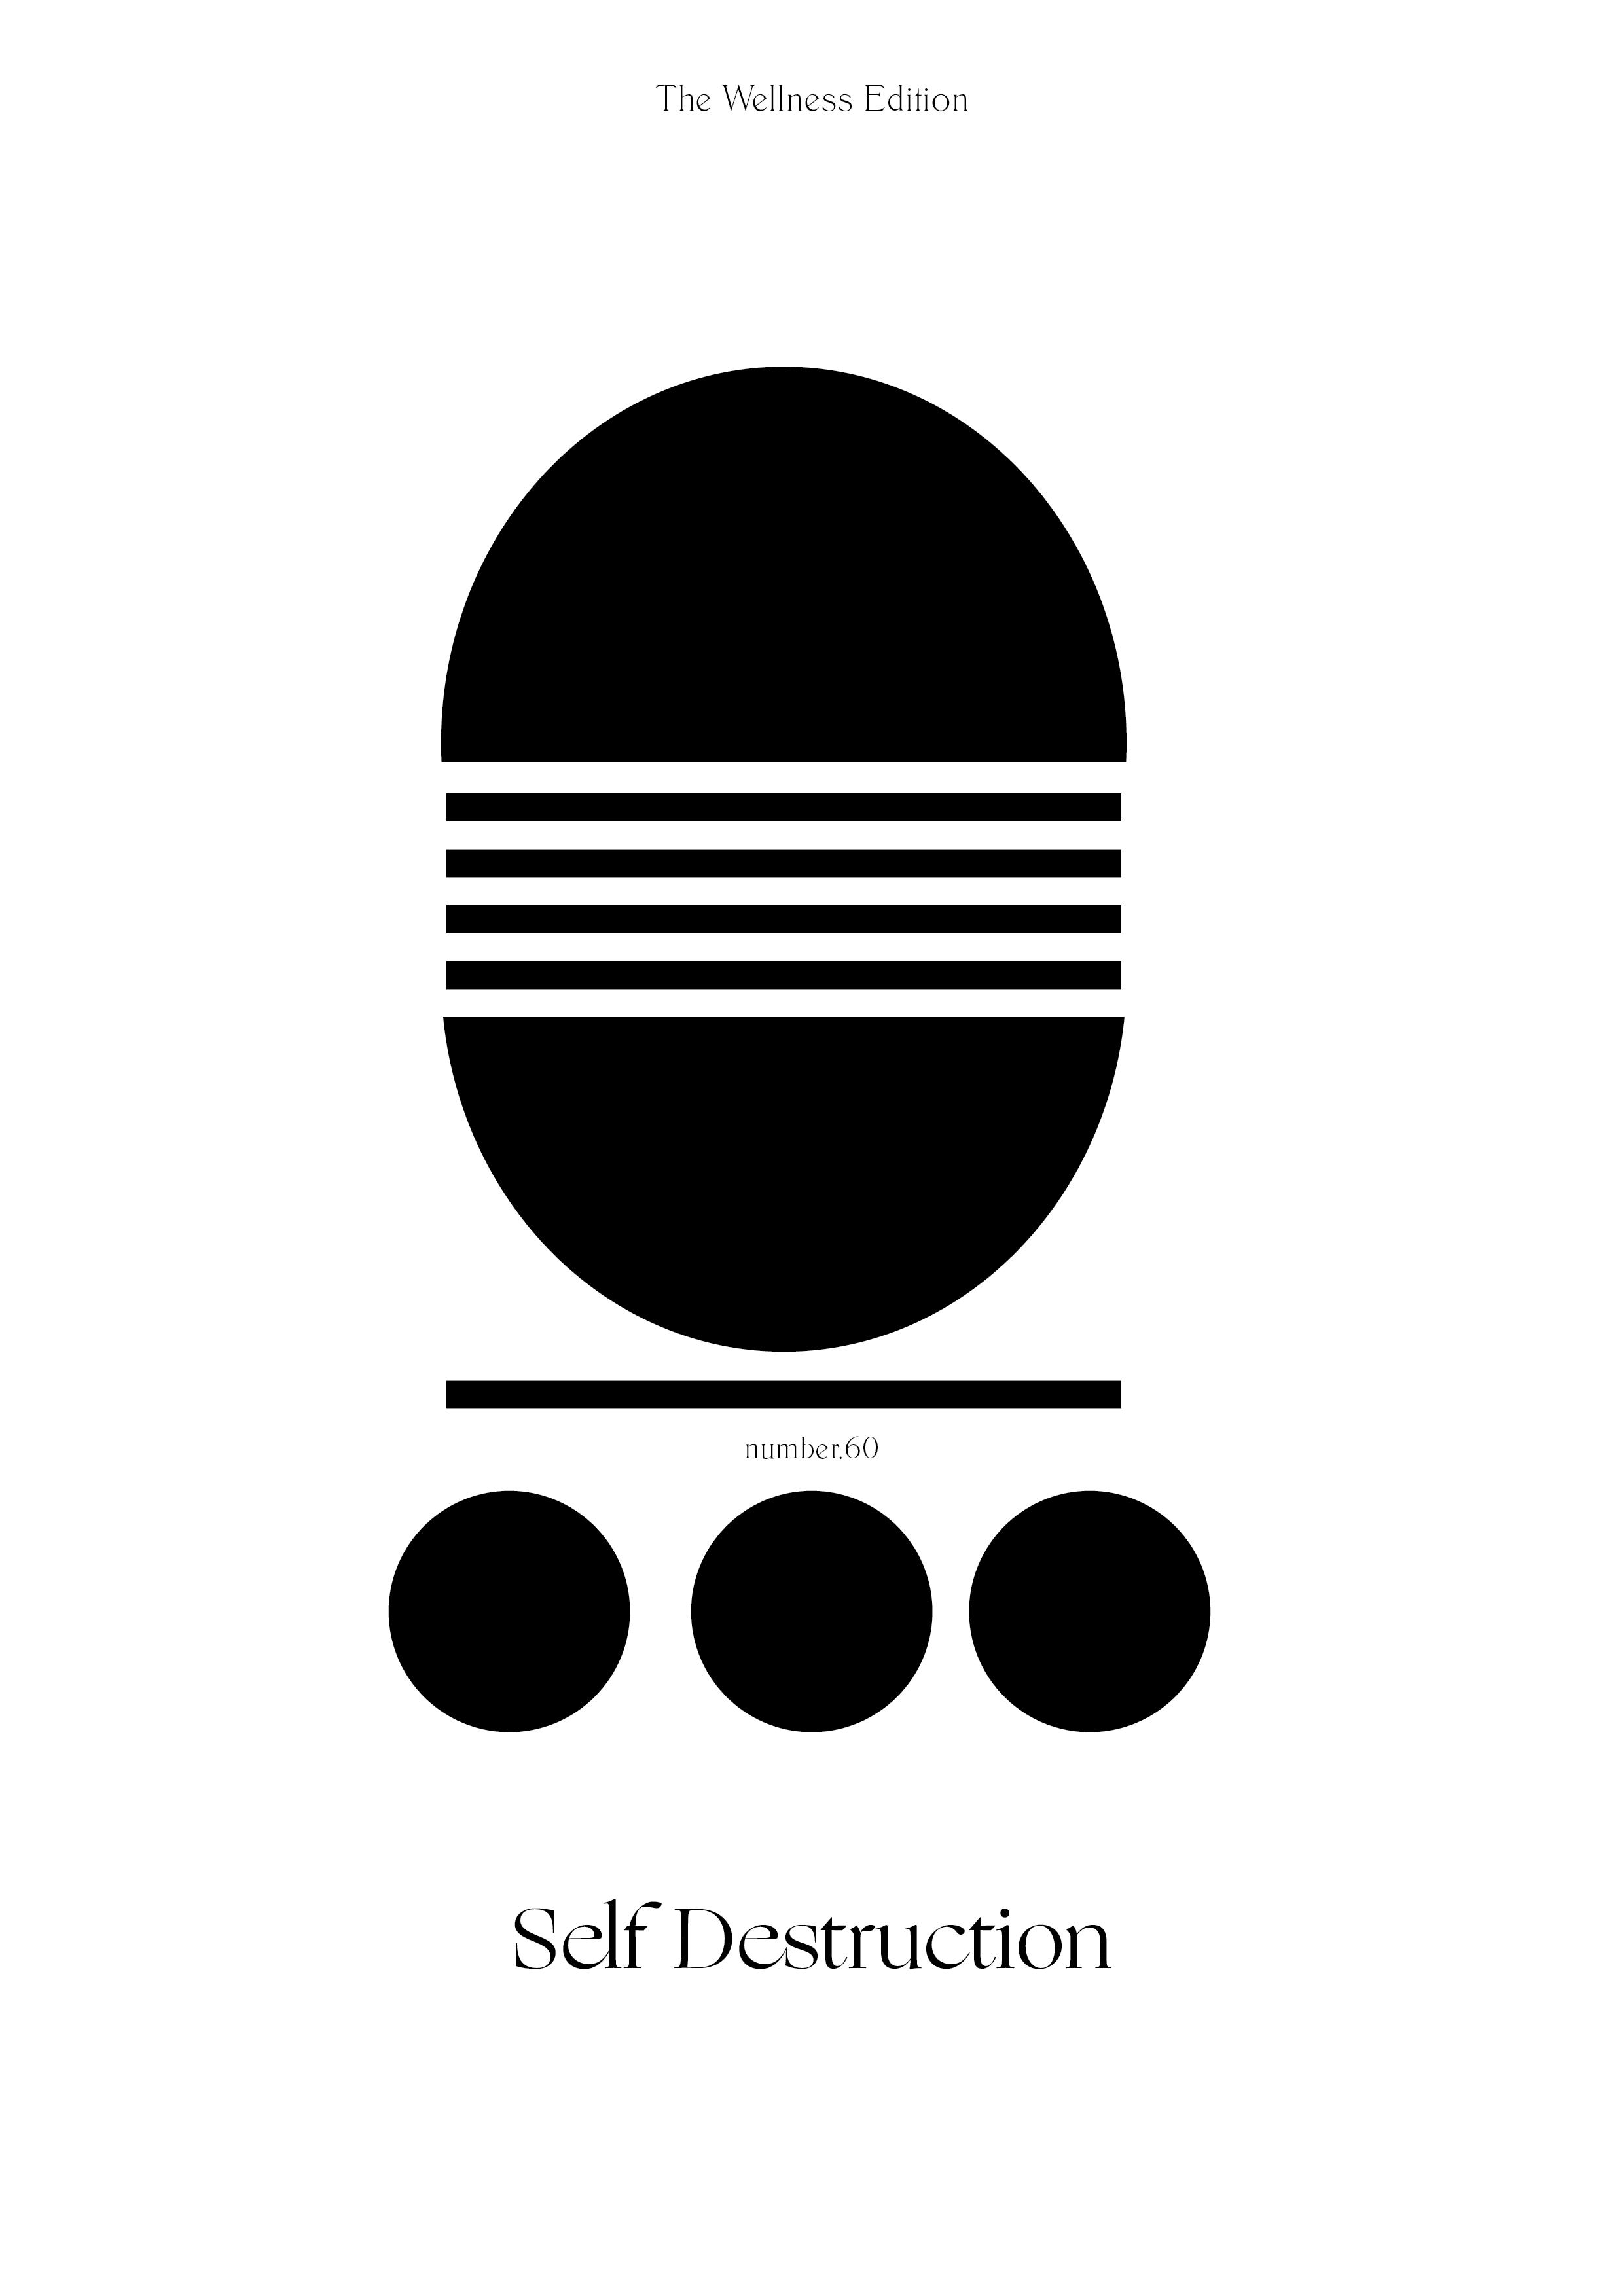 The Wellness Edition No.60 // Self-Destruction